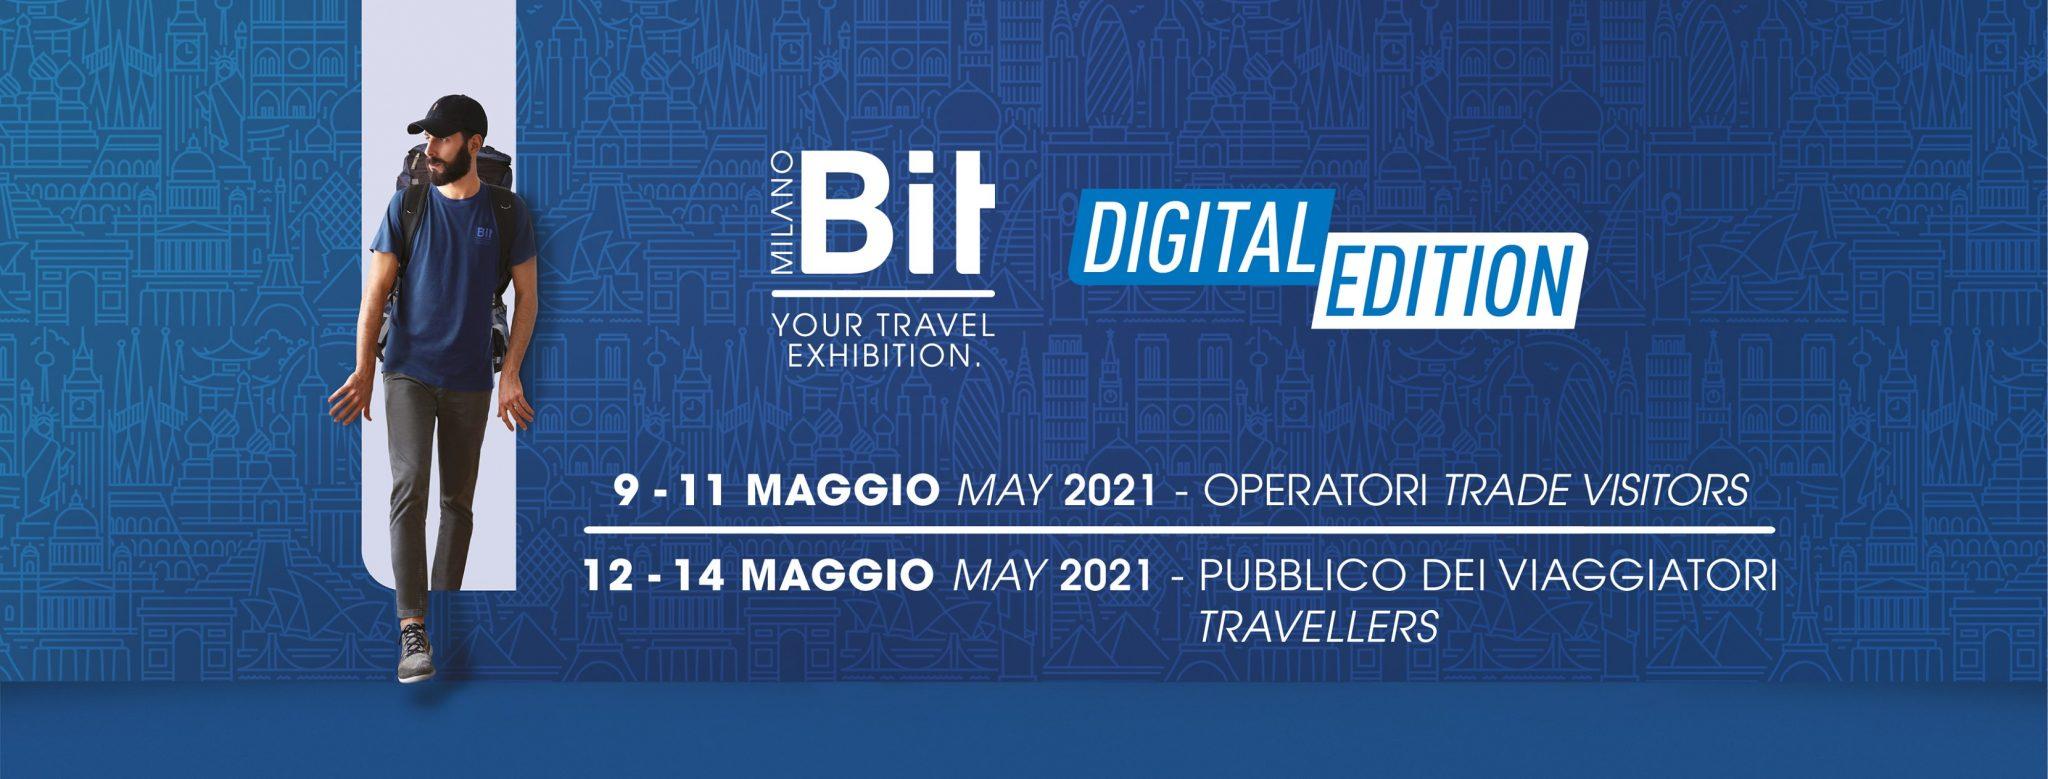 Bit 2021: turismo enogastronomico - Picnic Chic